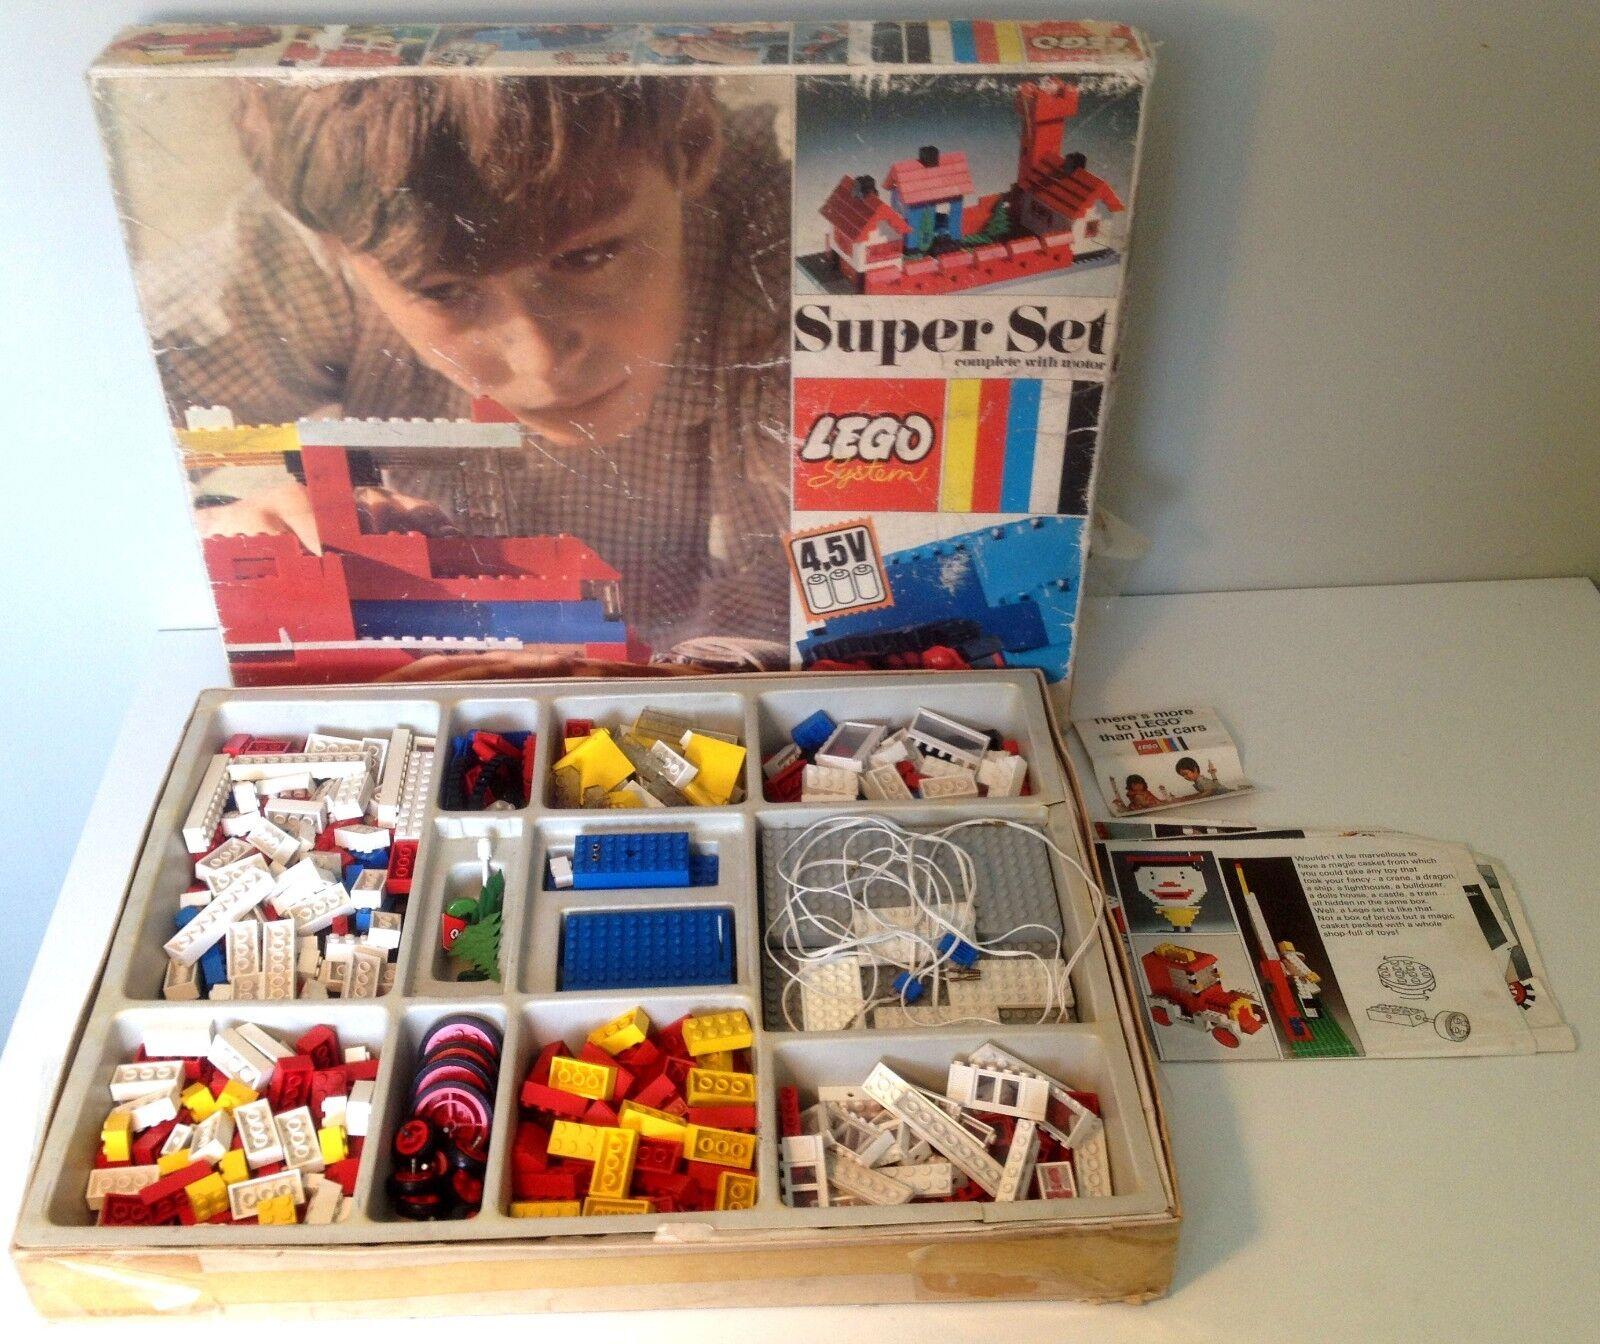 LEGO Universal Building Set Super Set (088)